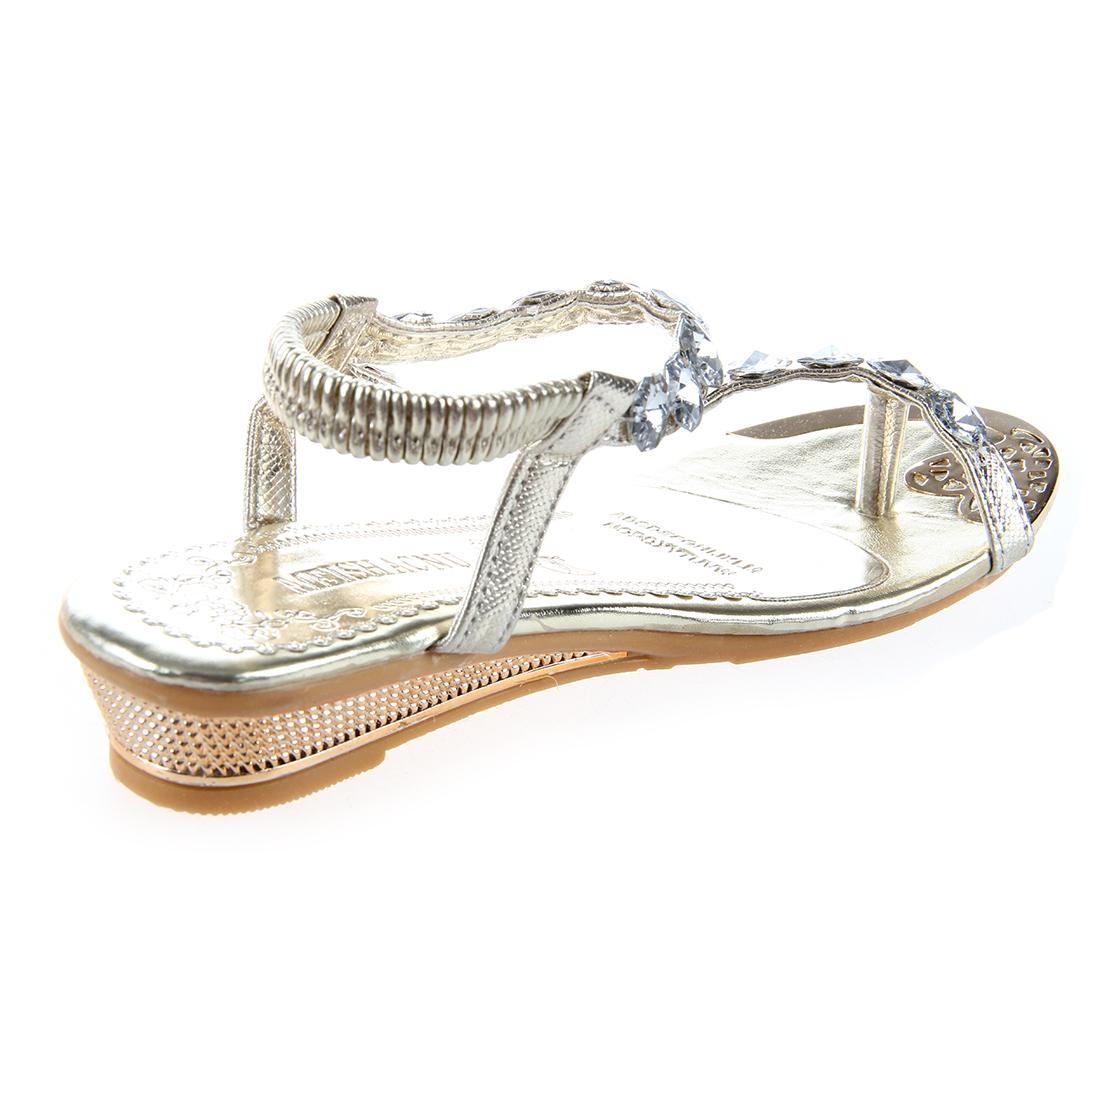 1-pair-Womens-Sandals-Ladies-Low-Heel-Sparkling-Shoes-Rhinestone-Diamante-F-L3D7